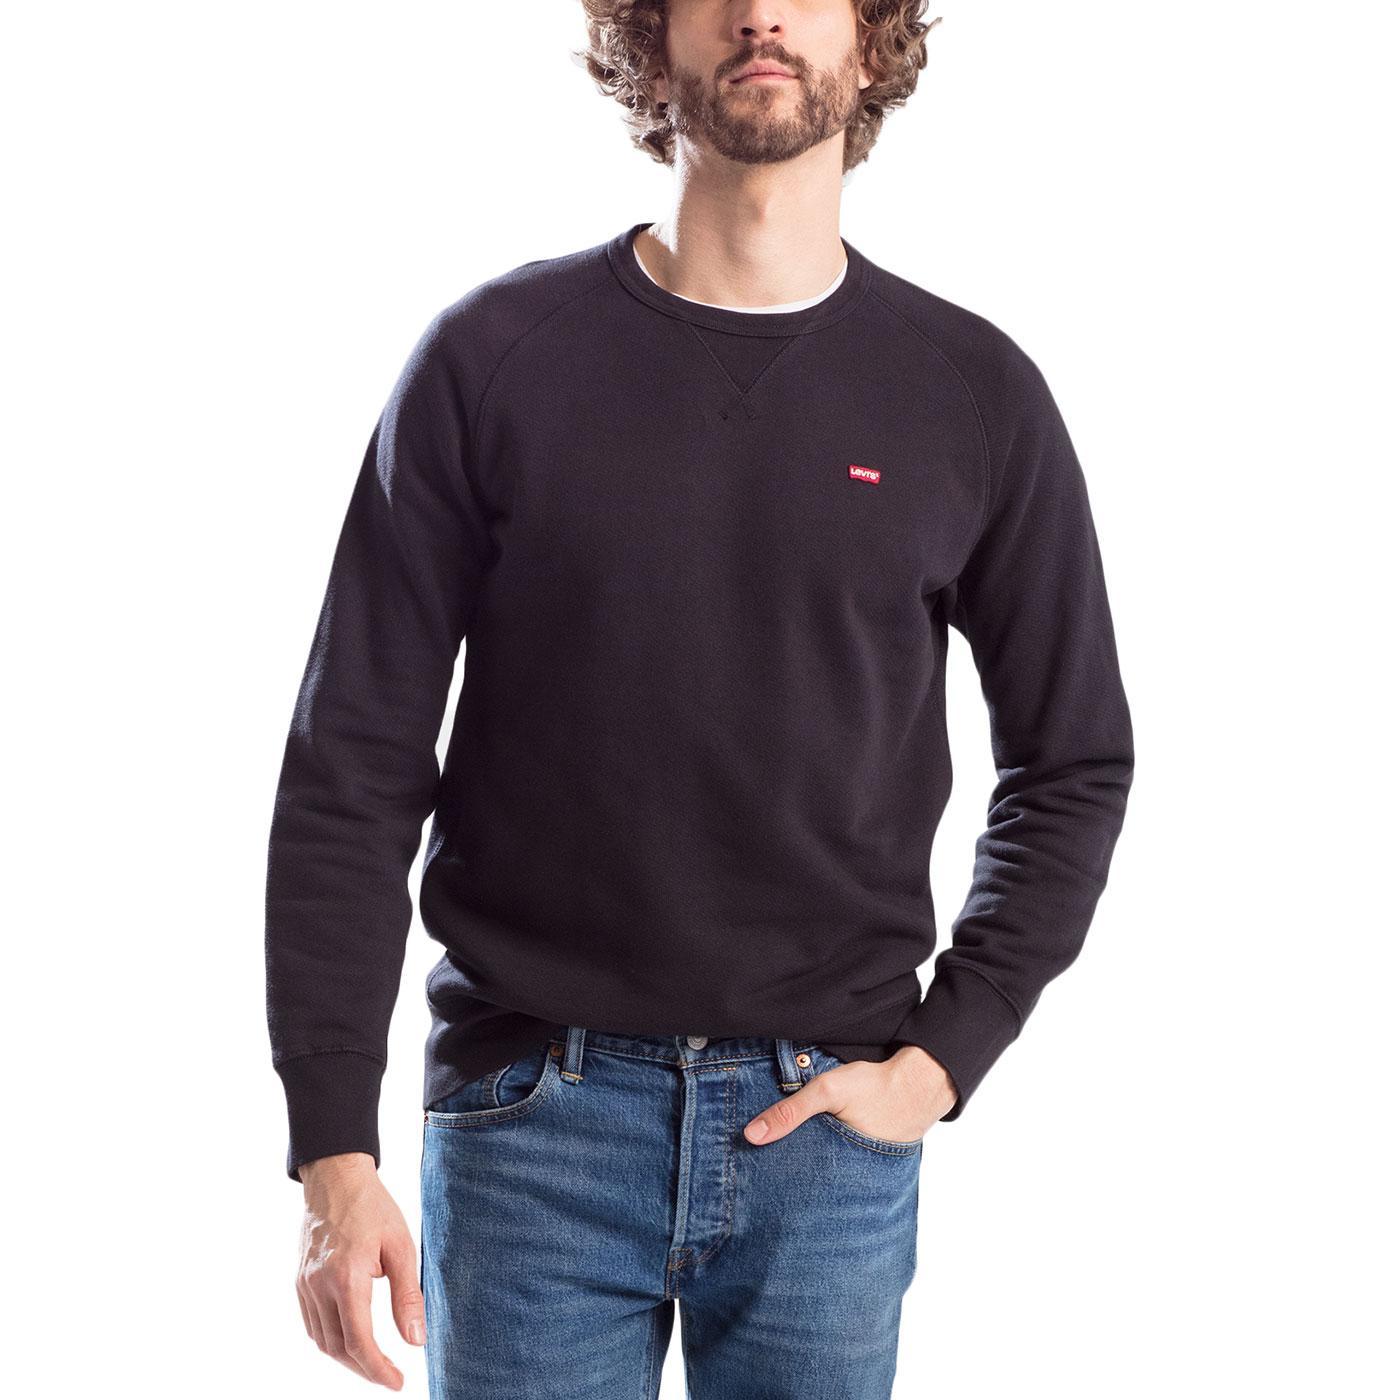 LEVI'S Original Icon Retro Crew Sweatshirt (Black)